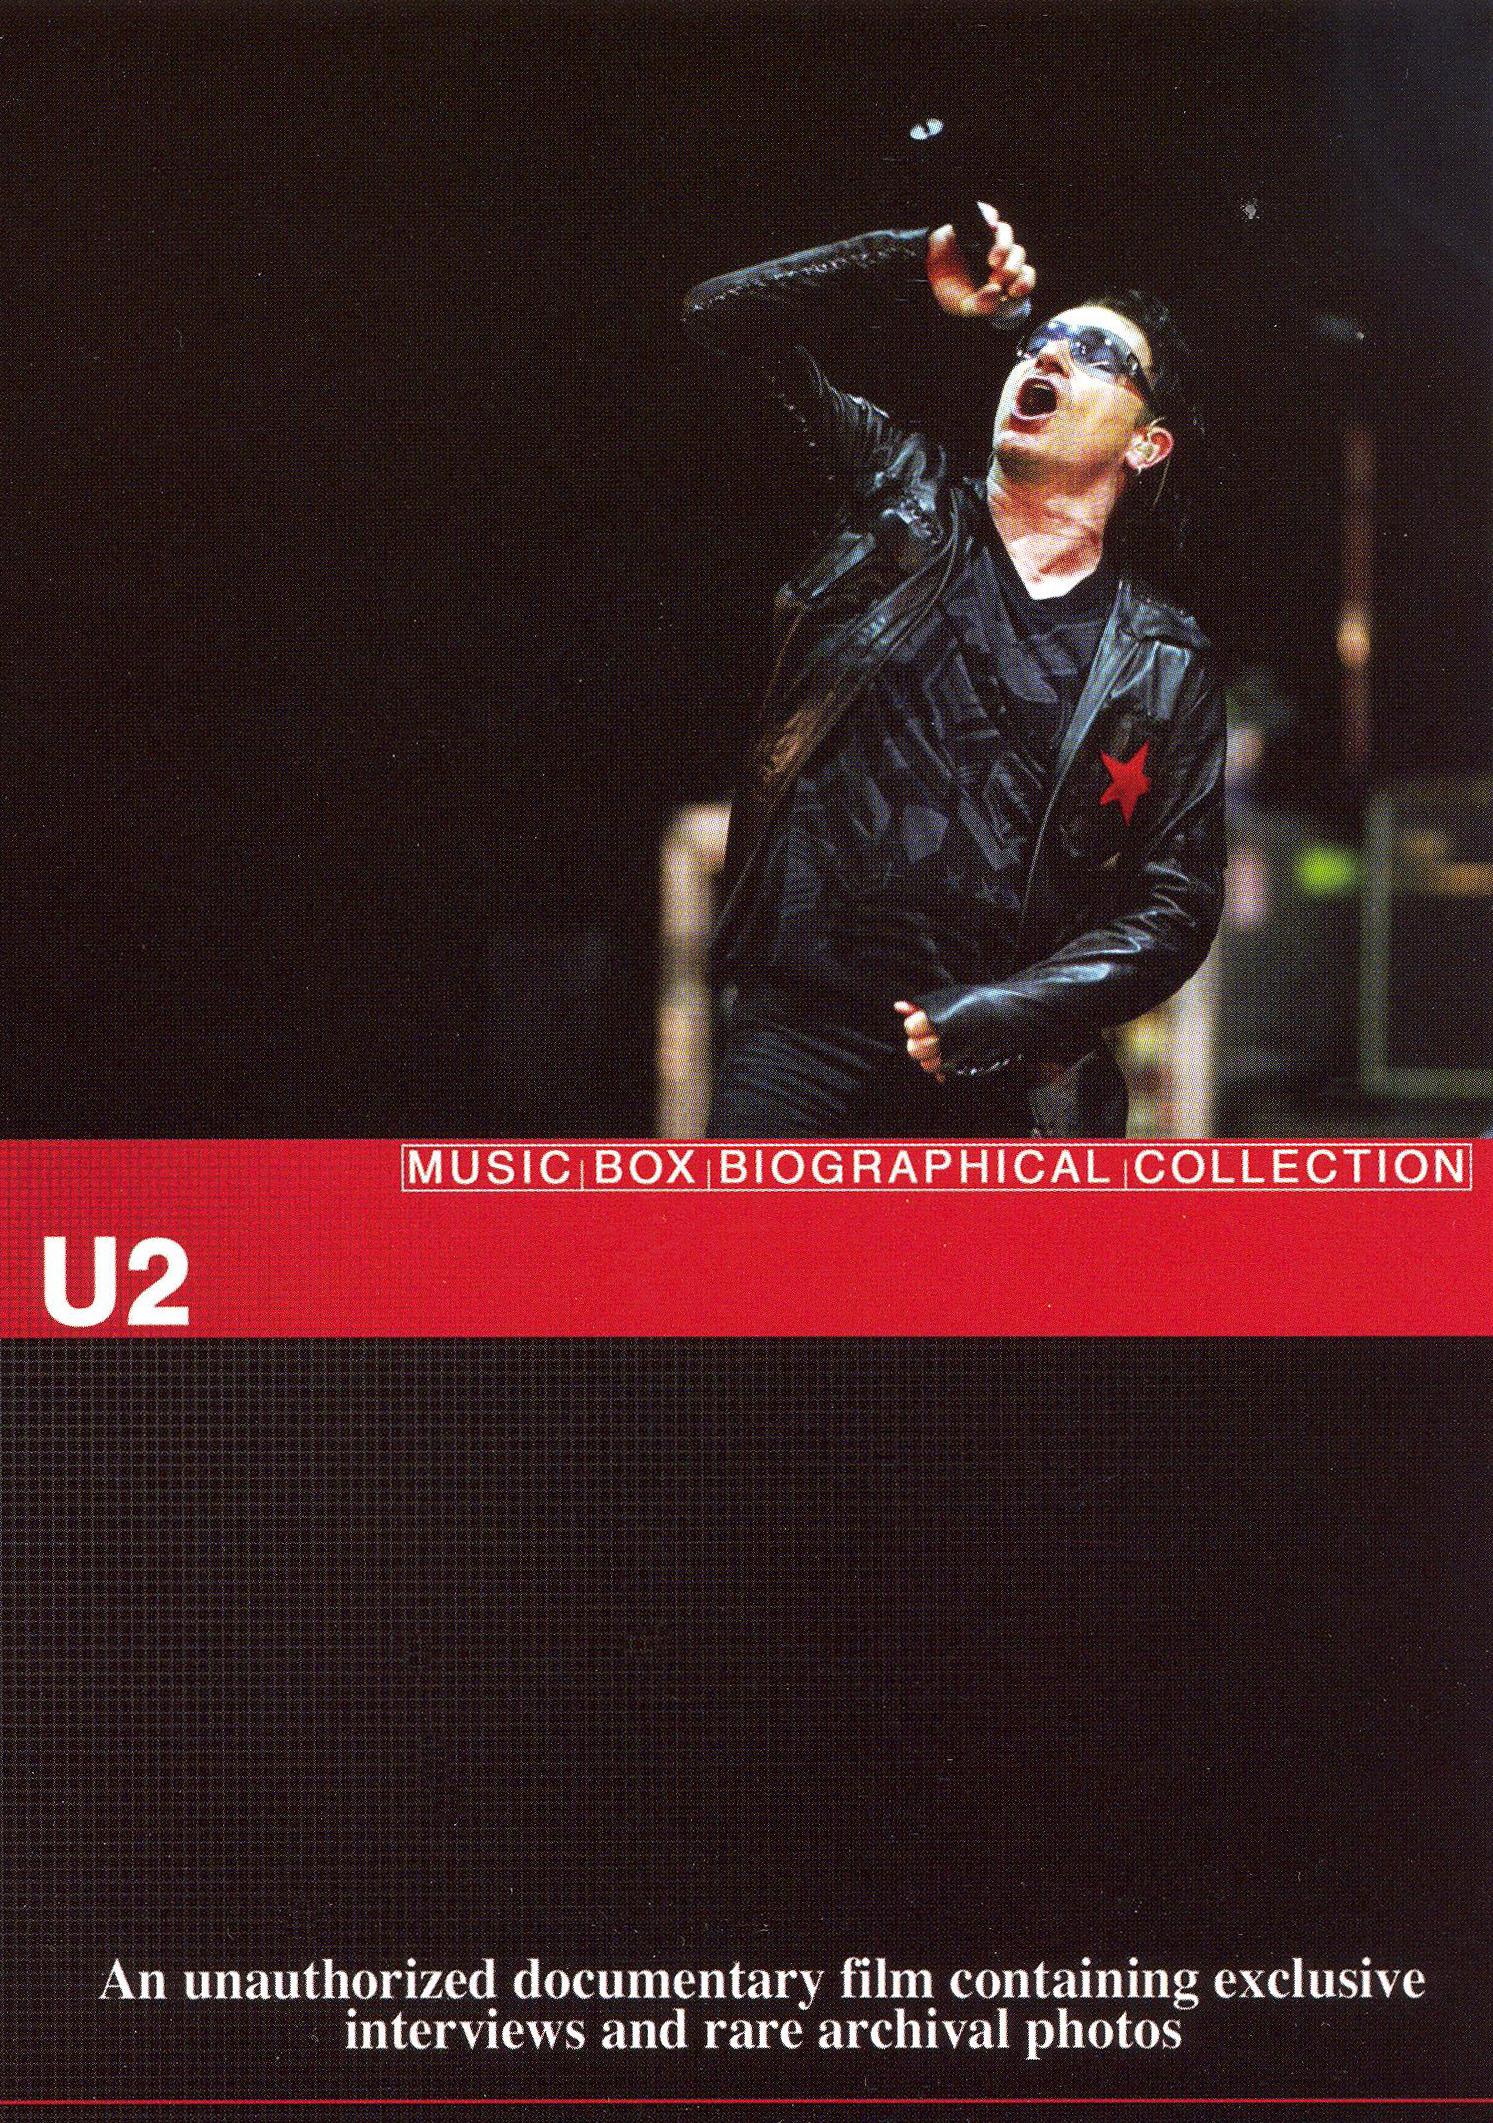 Music Box Biographical Collection: U2